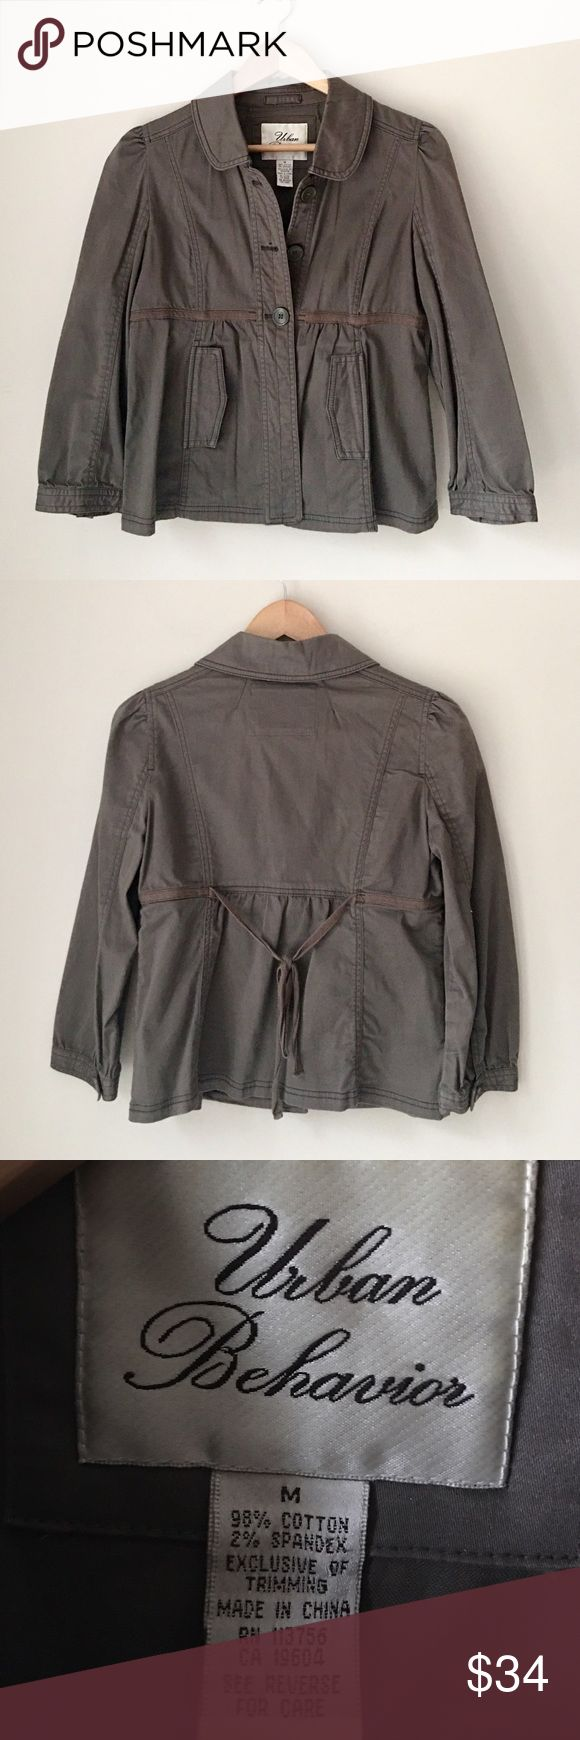 Urban Behavior Utility Jacket Olive green khaki jacket by Urban Behavior. Button front. Tie back. 98% cotton 2% spandex. Size Medium. EUC. Urban Behavior Jackets & Coats Utility Jackets